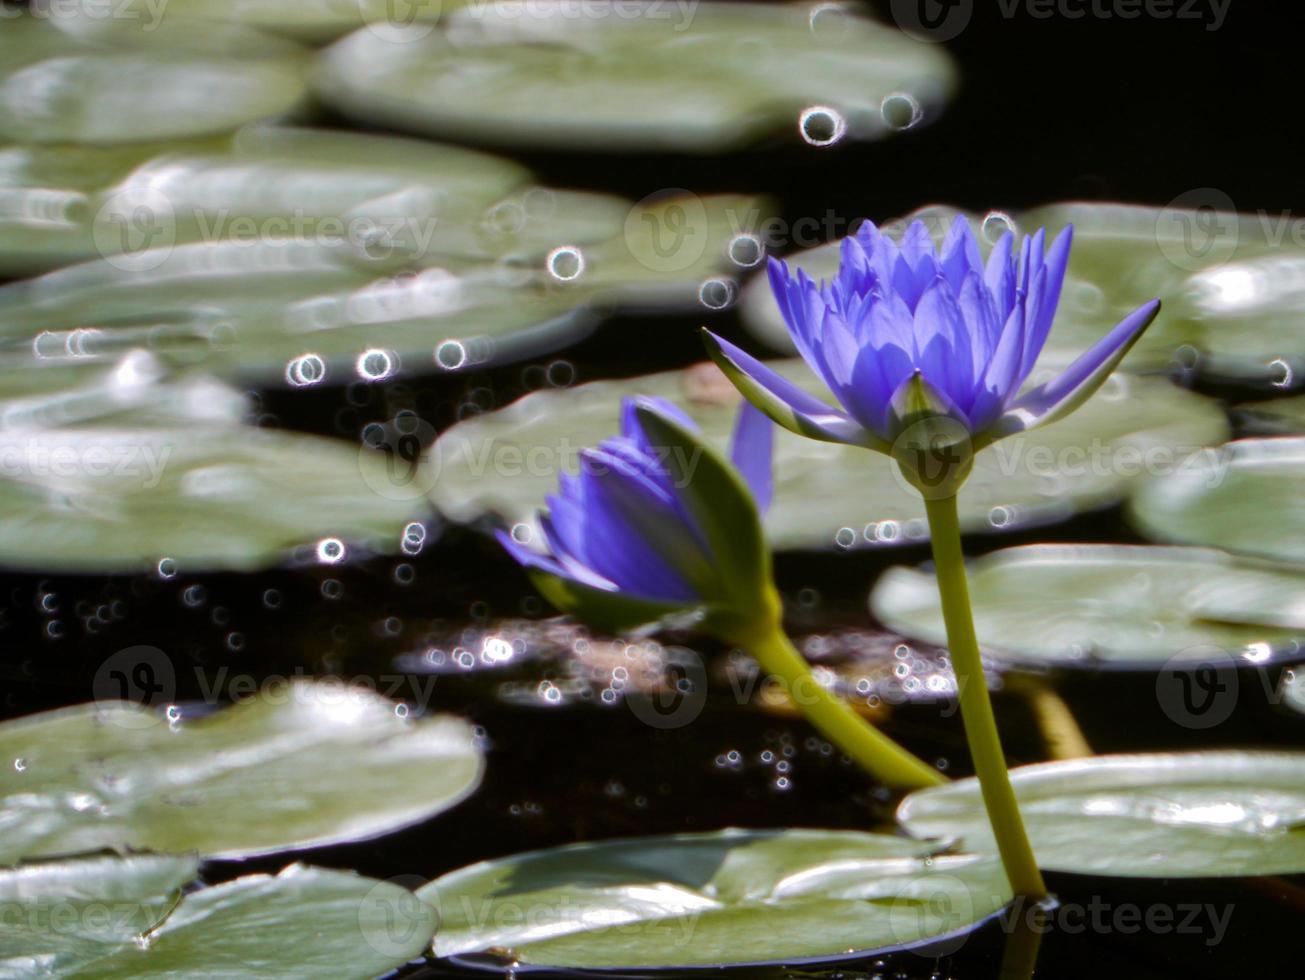 blauwgele lotusbloem als olieverf. foto